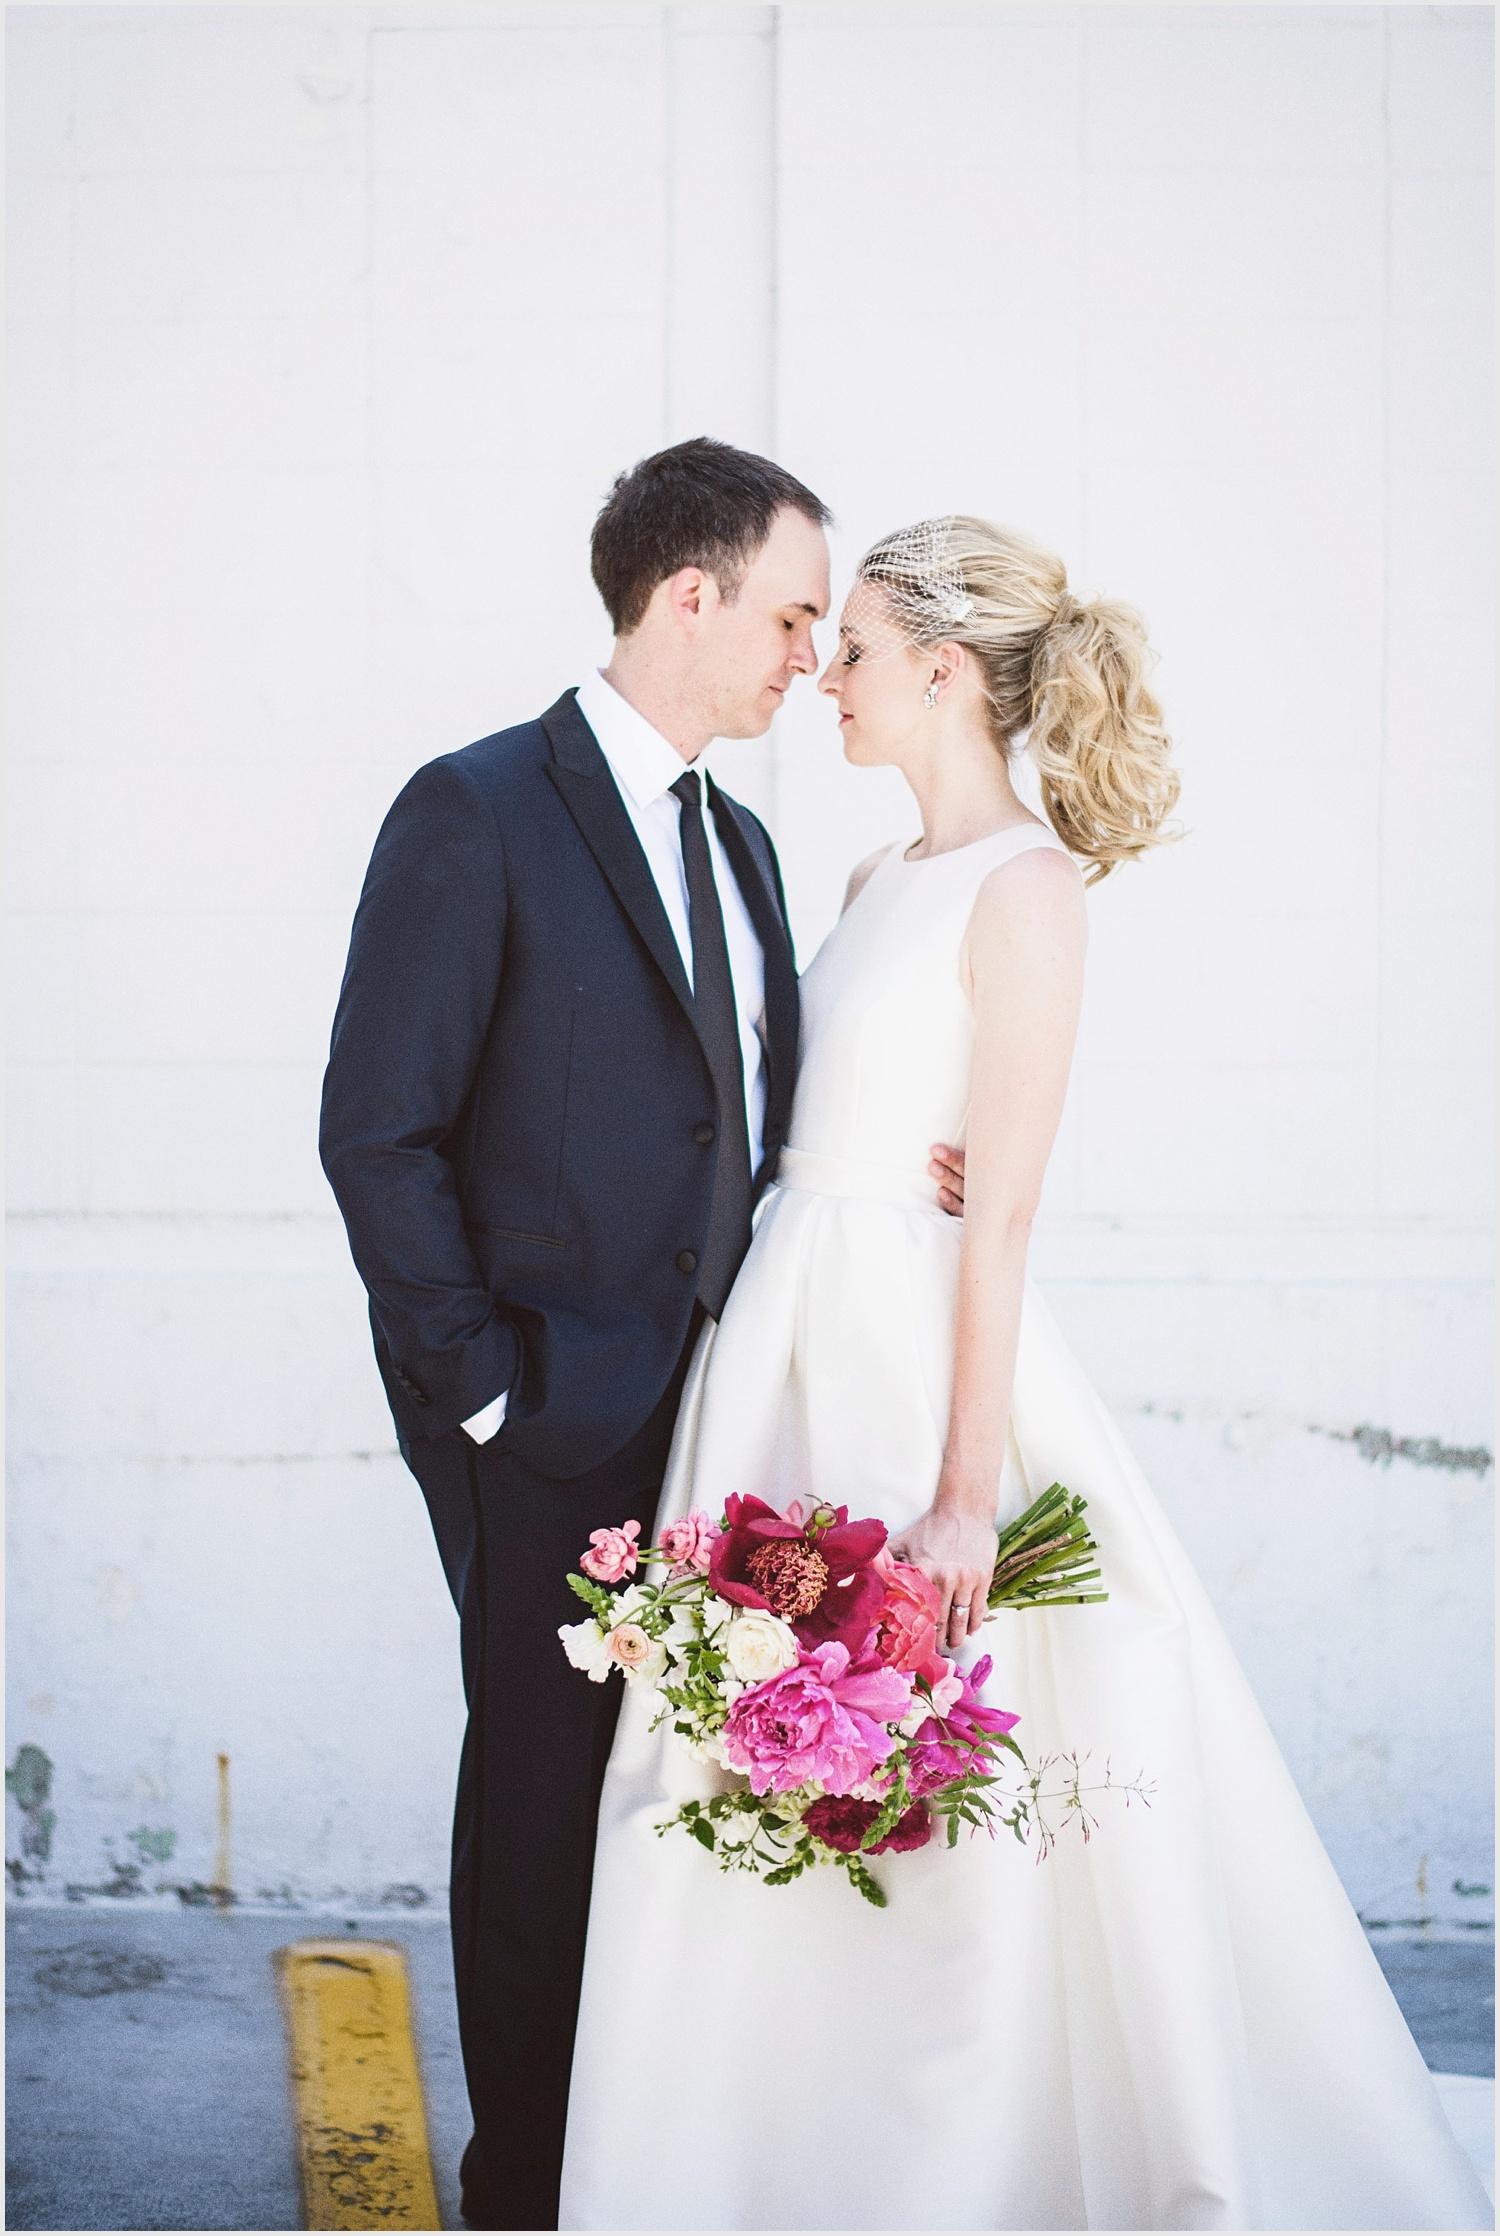 solar_arts_wedding_minneapolis_by_lucas_botz_photography_0018.jpg